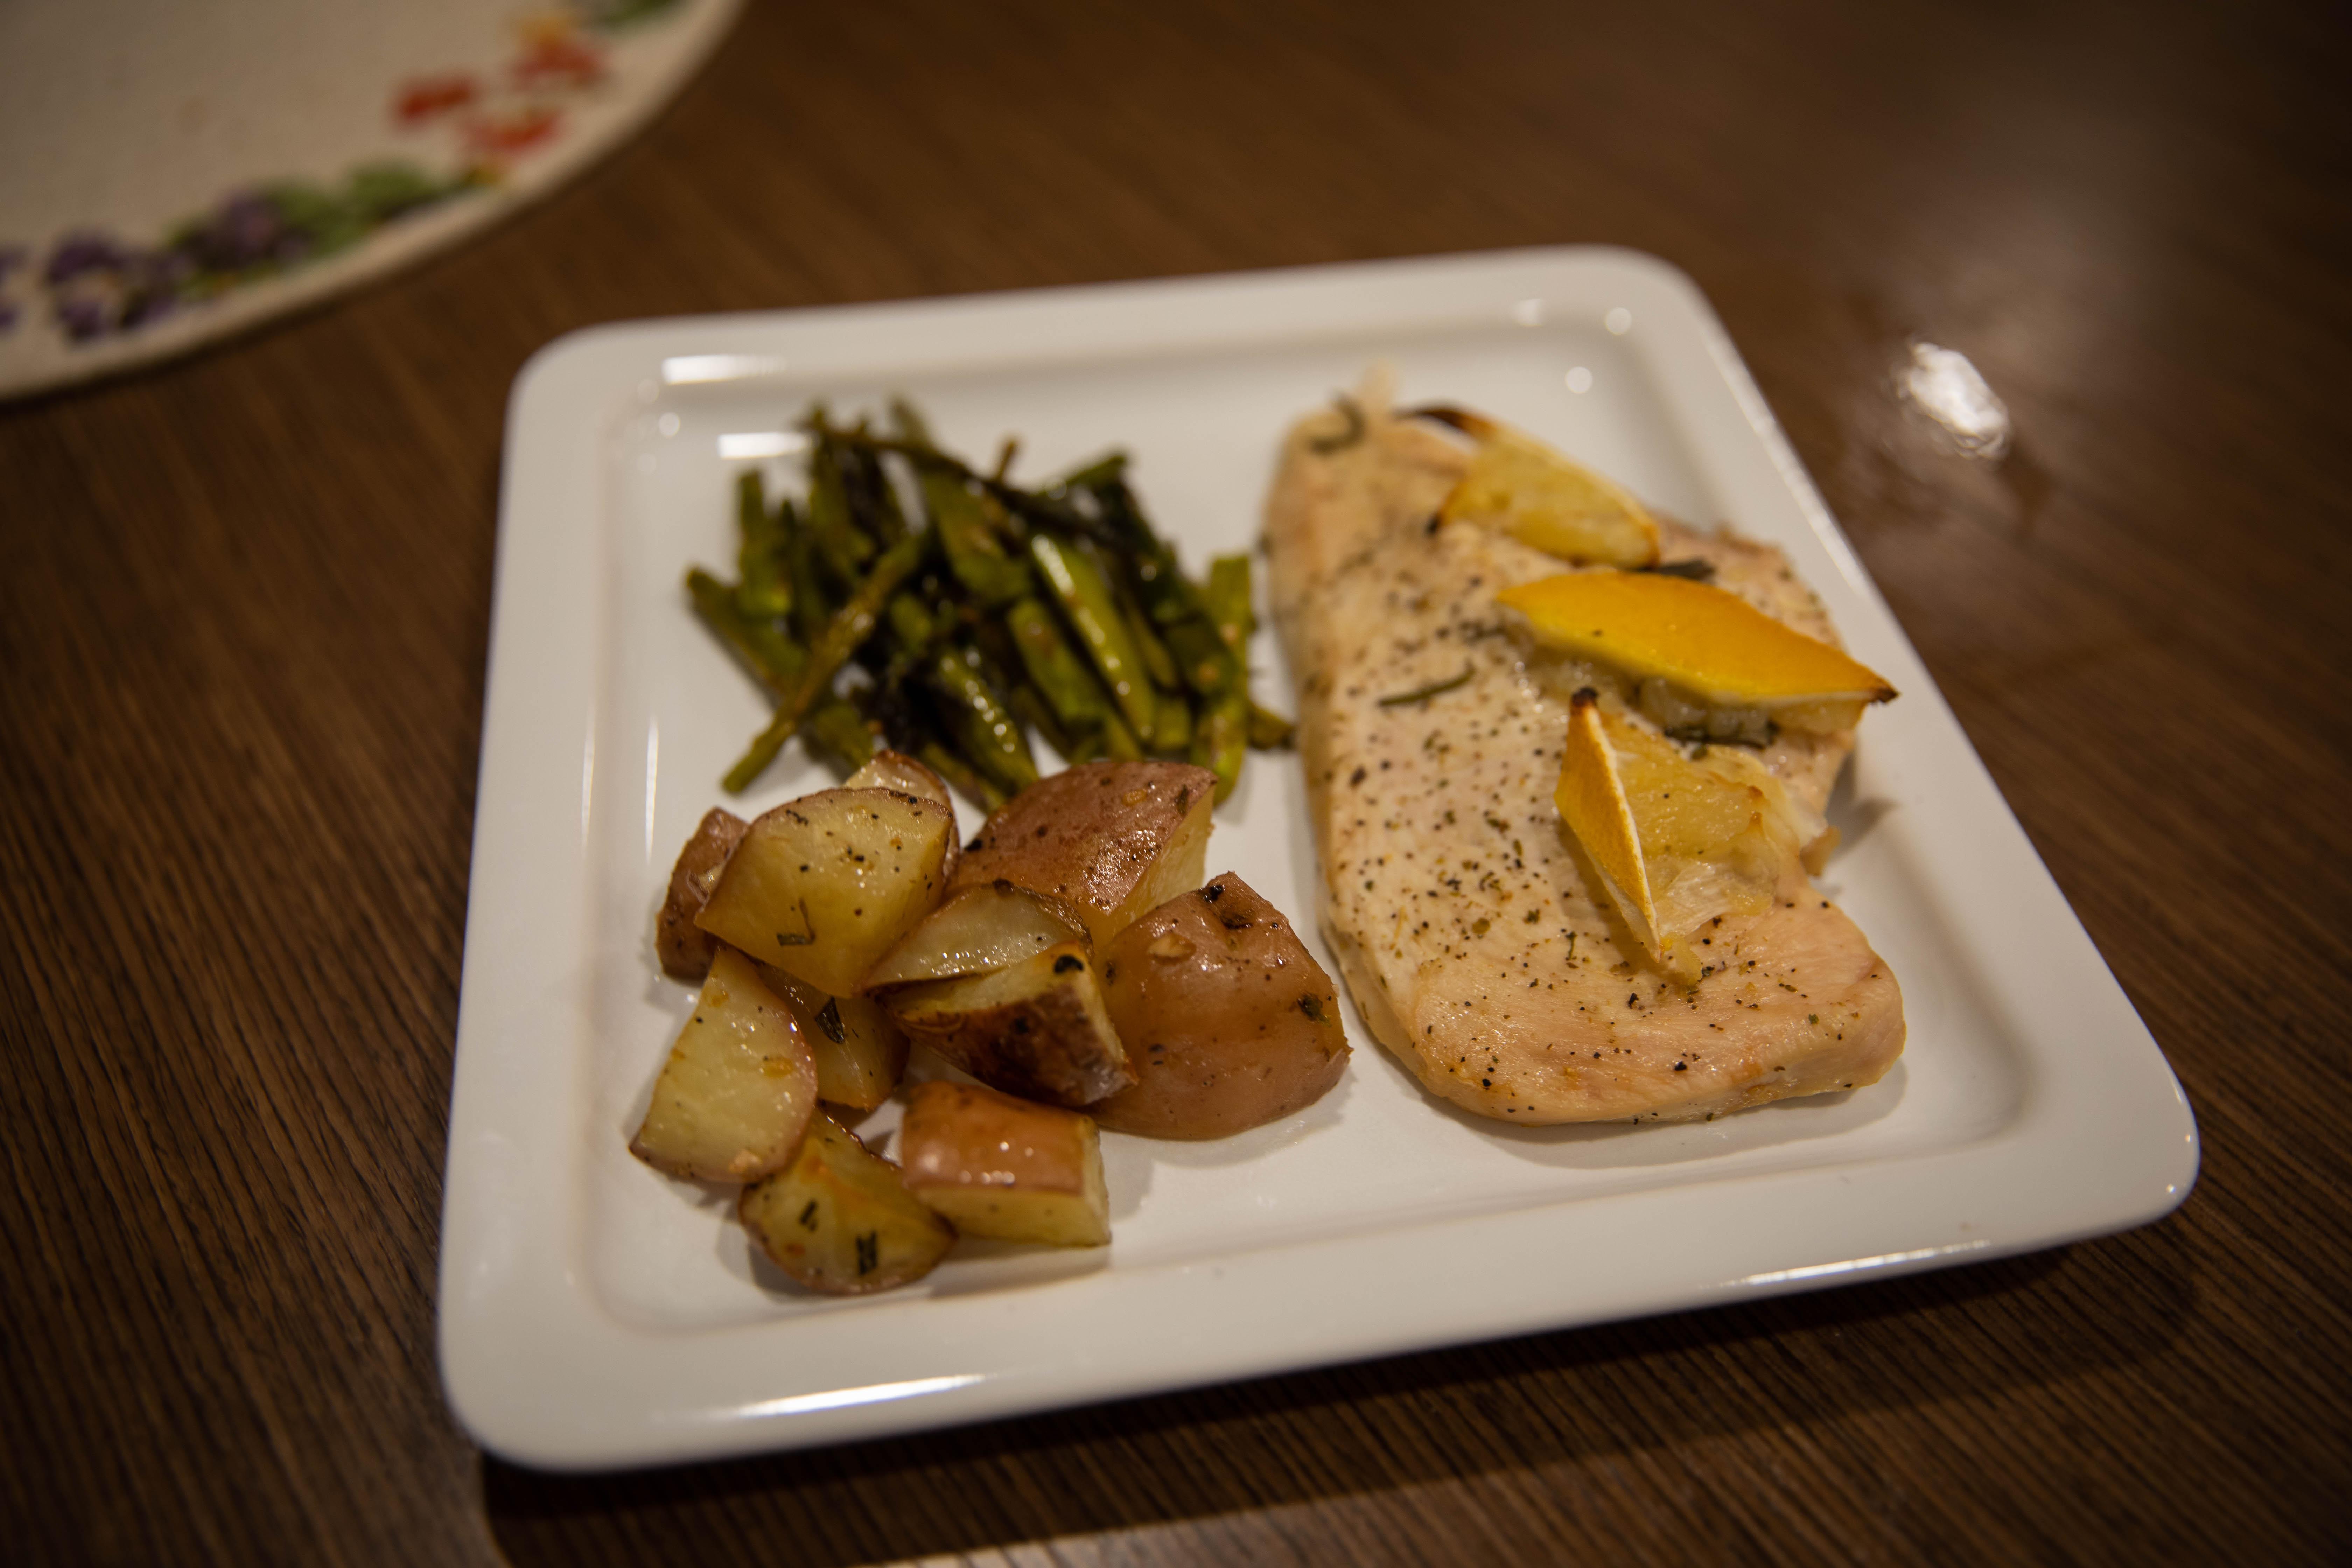 Plated food.